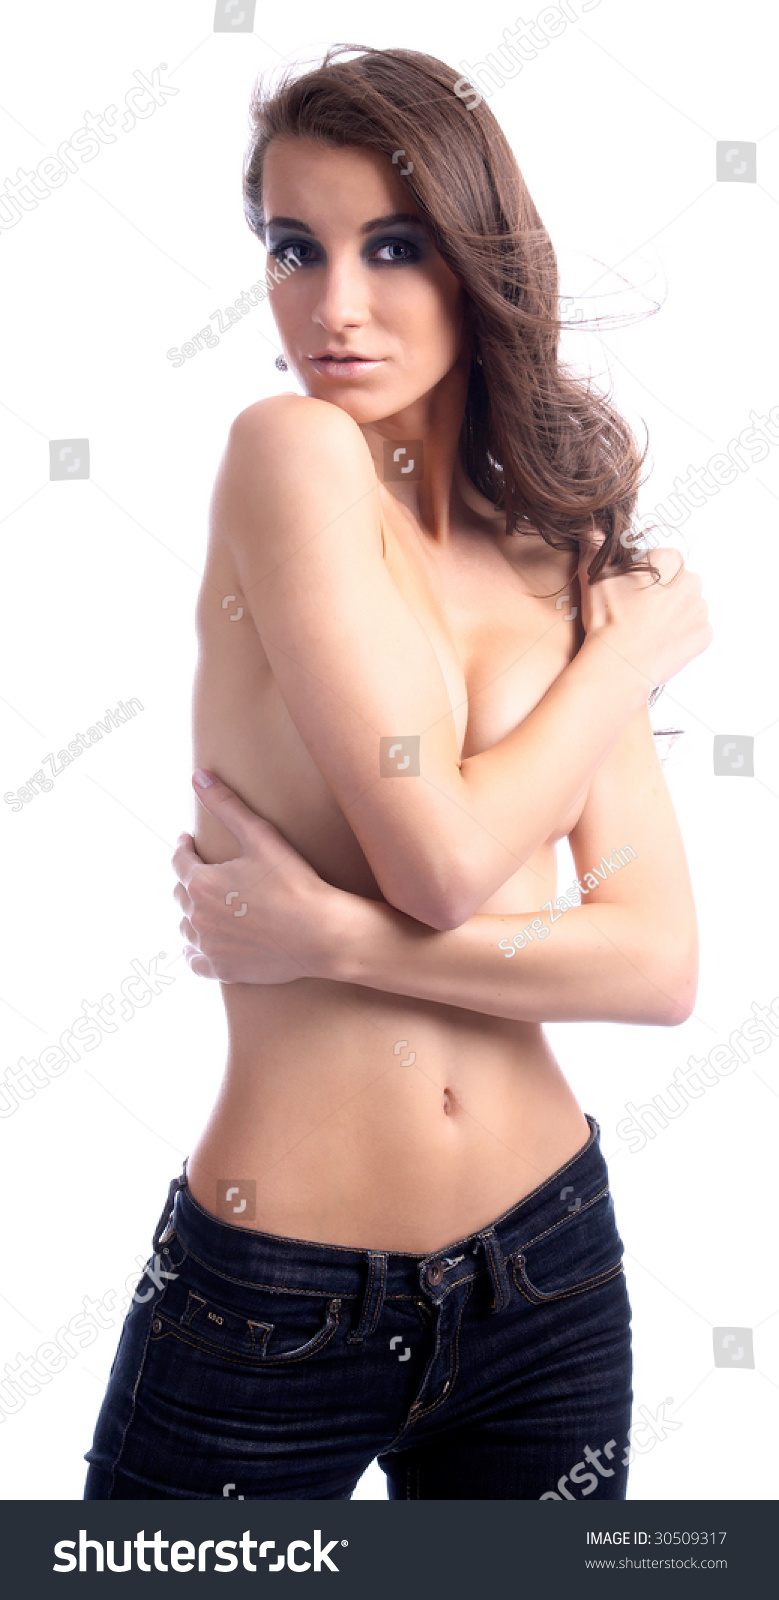 Voyeur masturbation clips